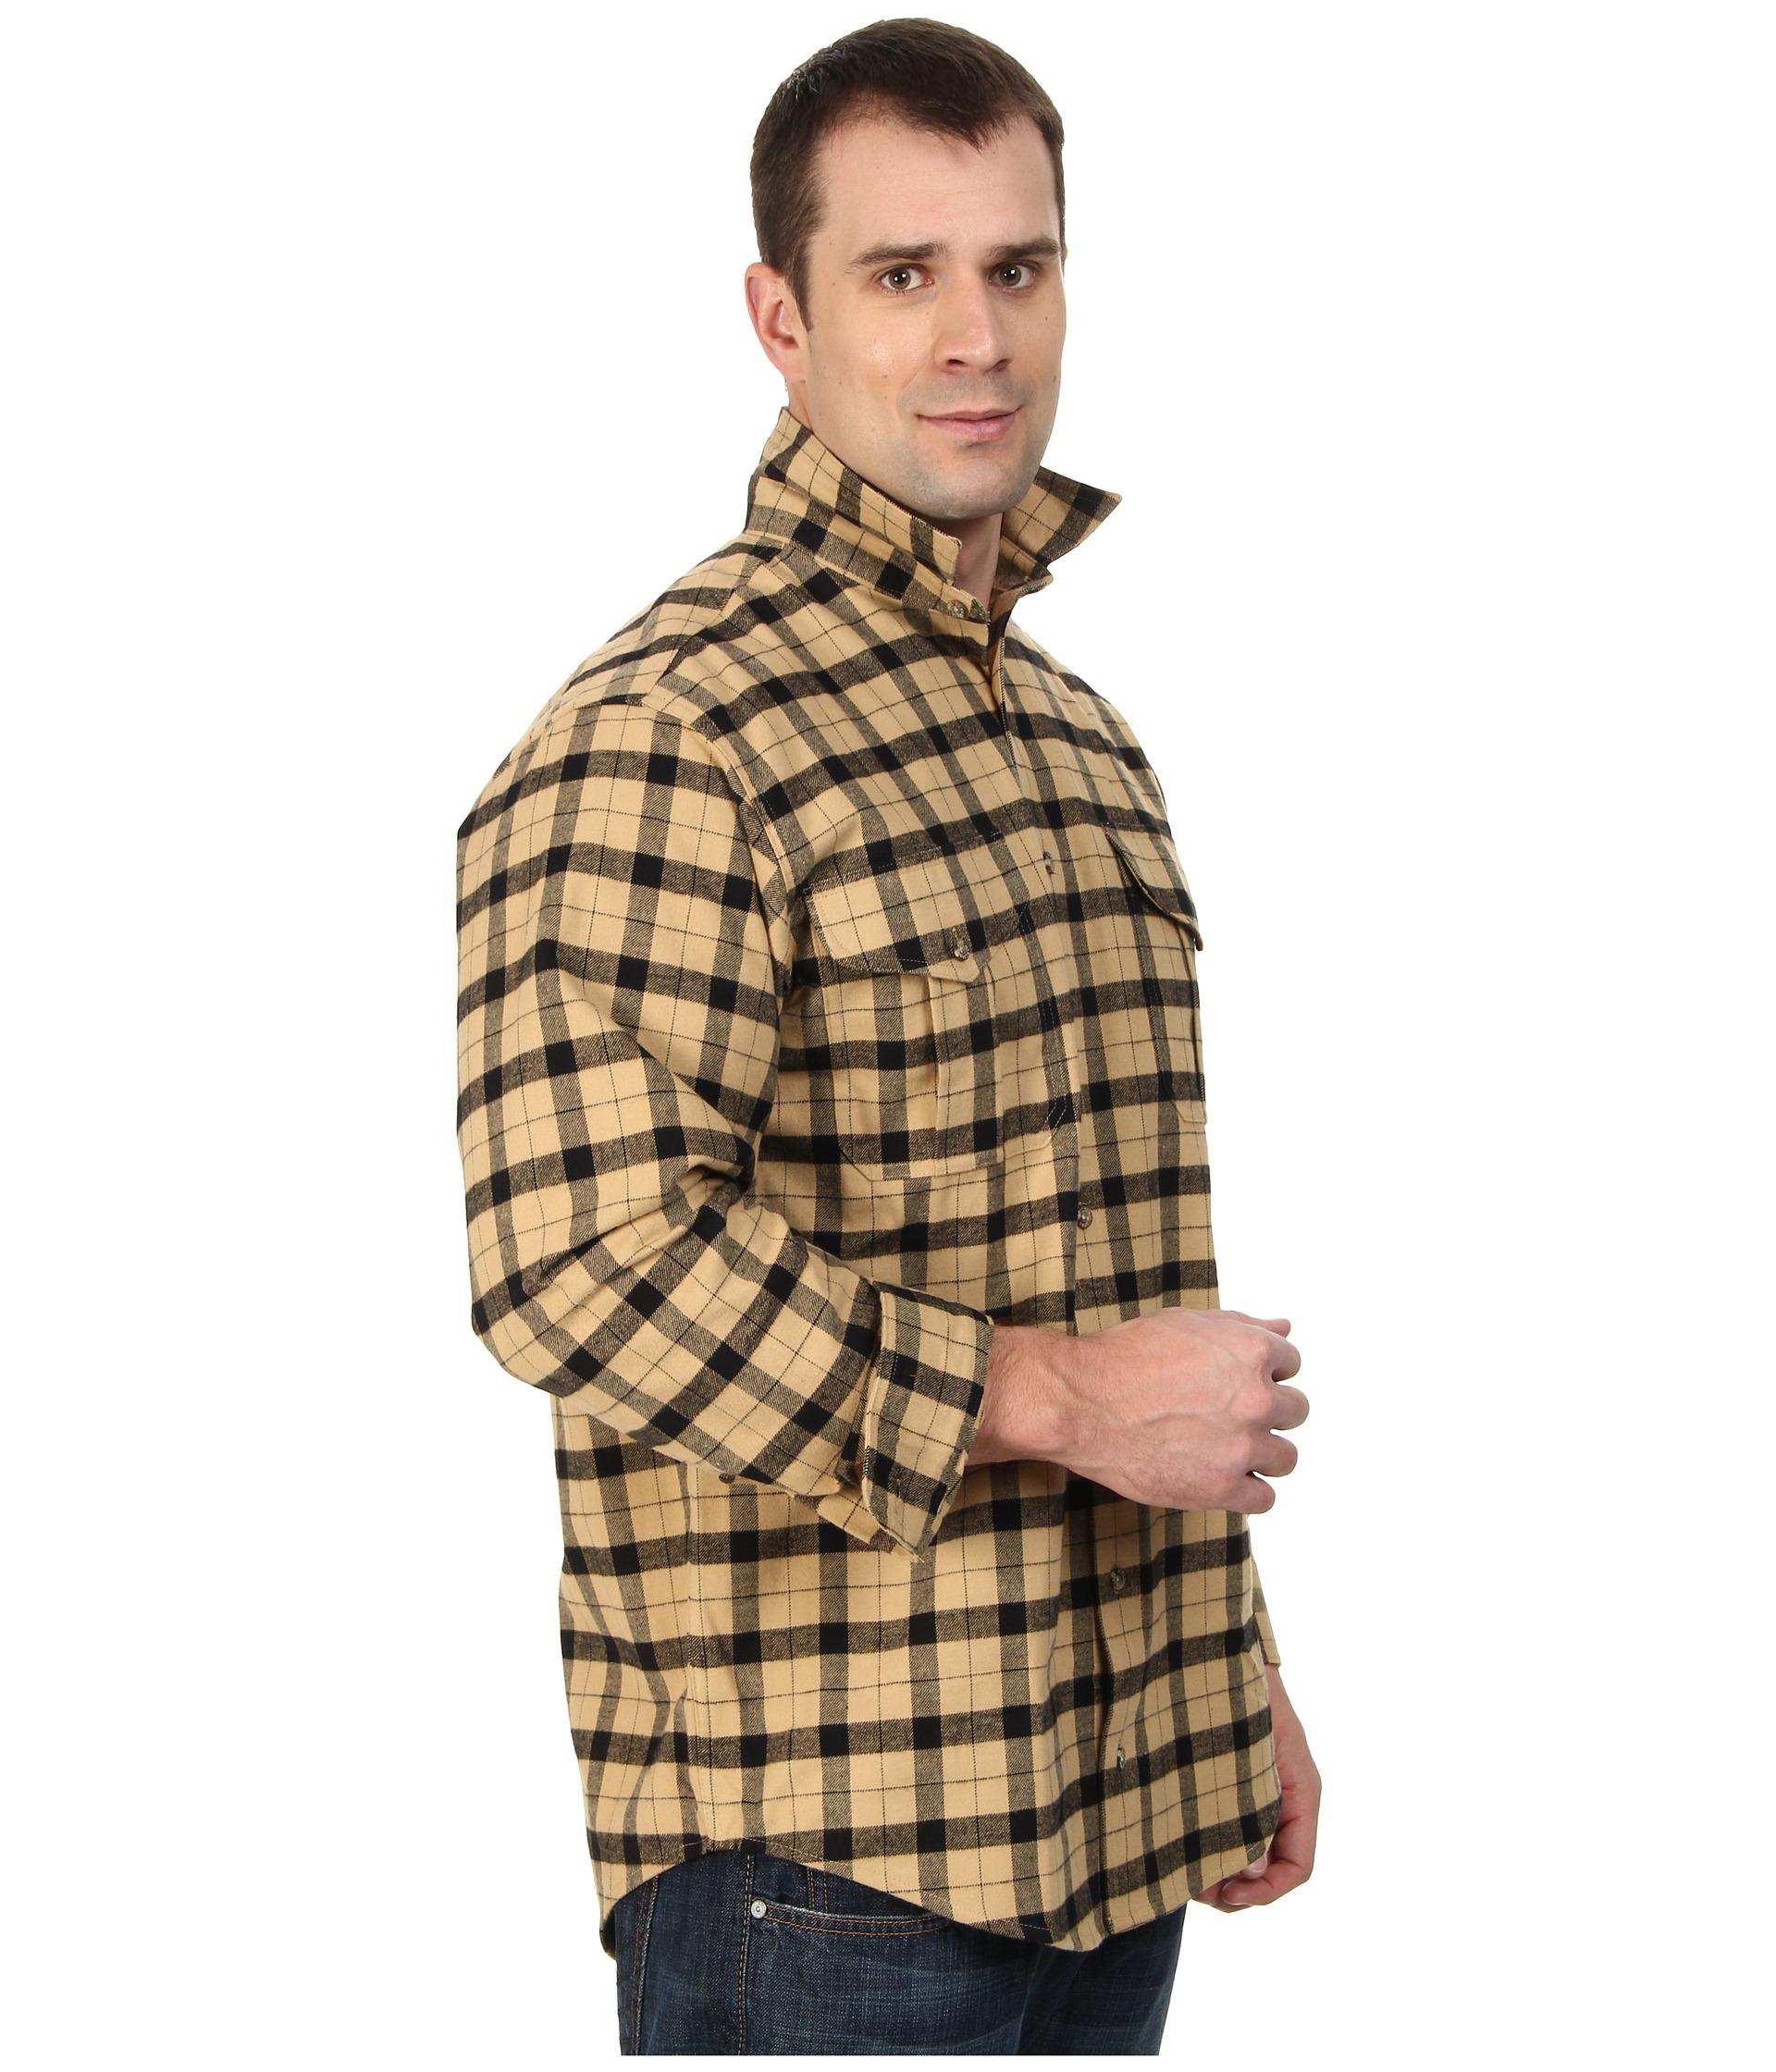 Filson Mens Extra Long Alaskan Guide Shirt